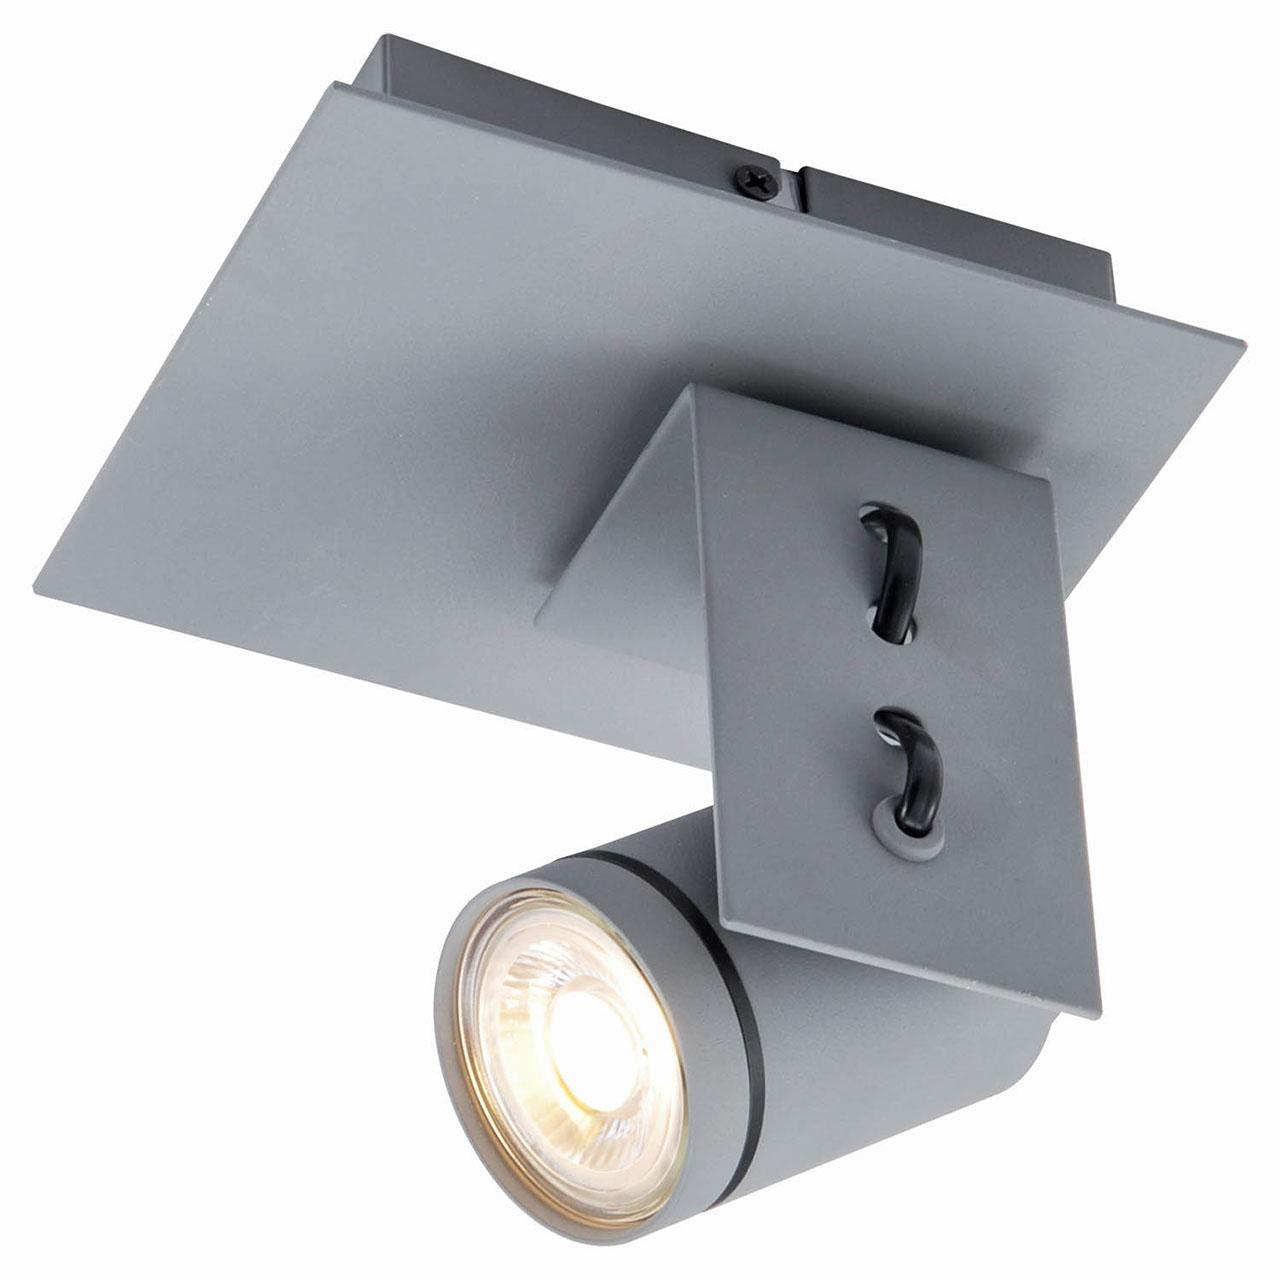 Спот Lussole Loft LSP-8022 спот lussole loft vii lsp 9320